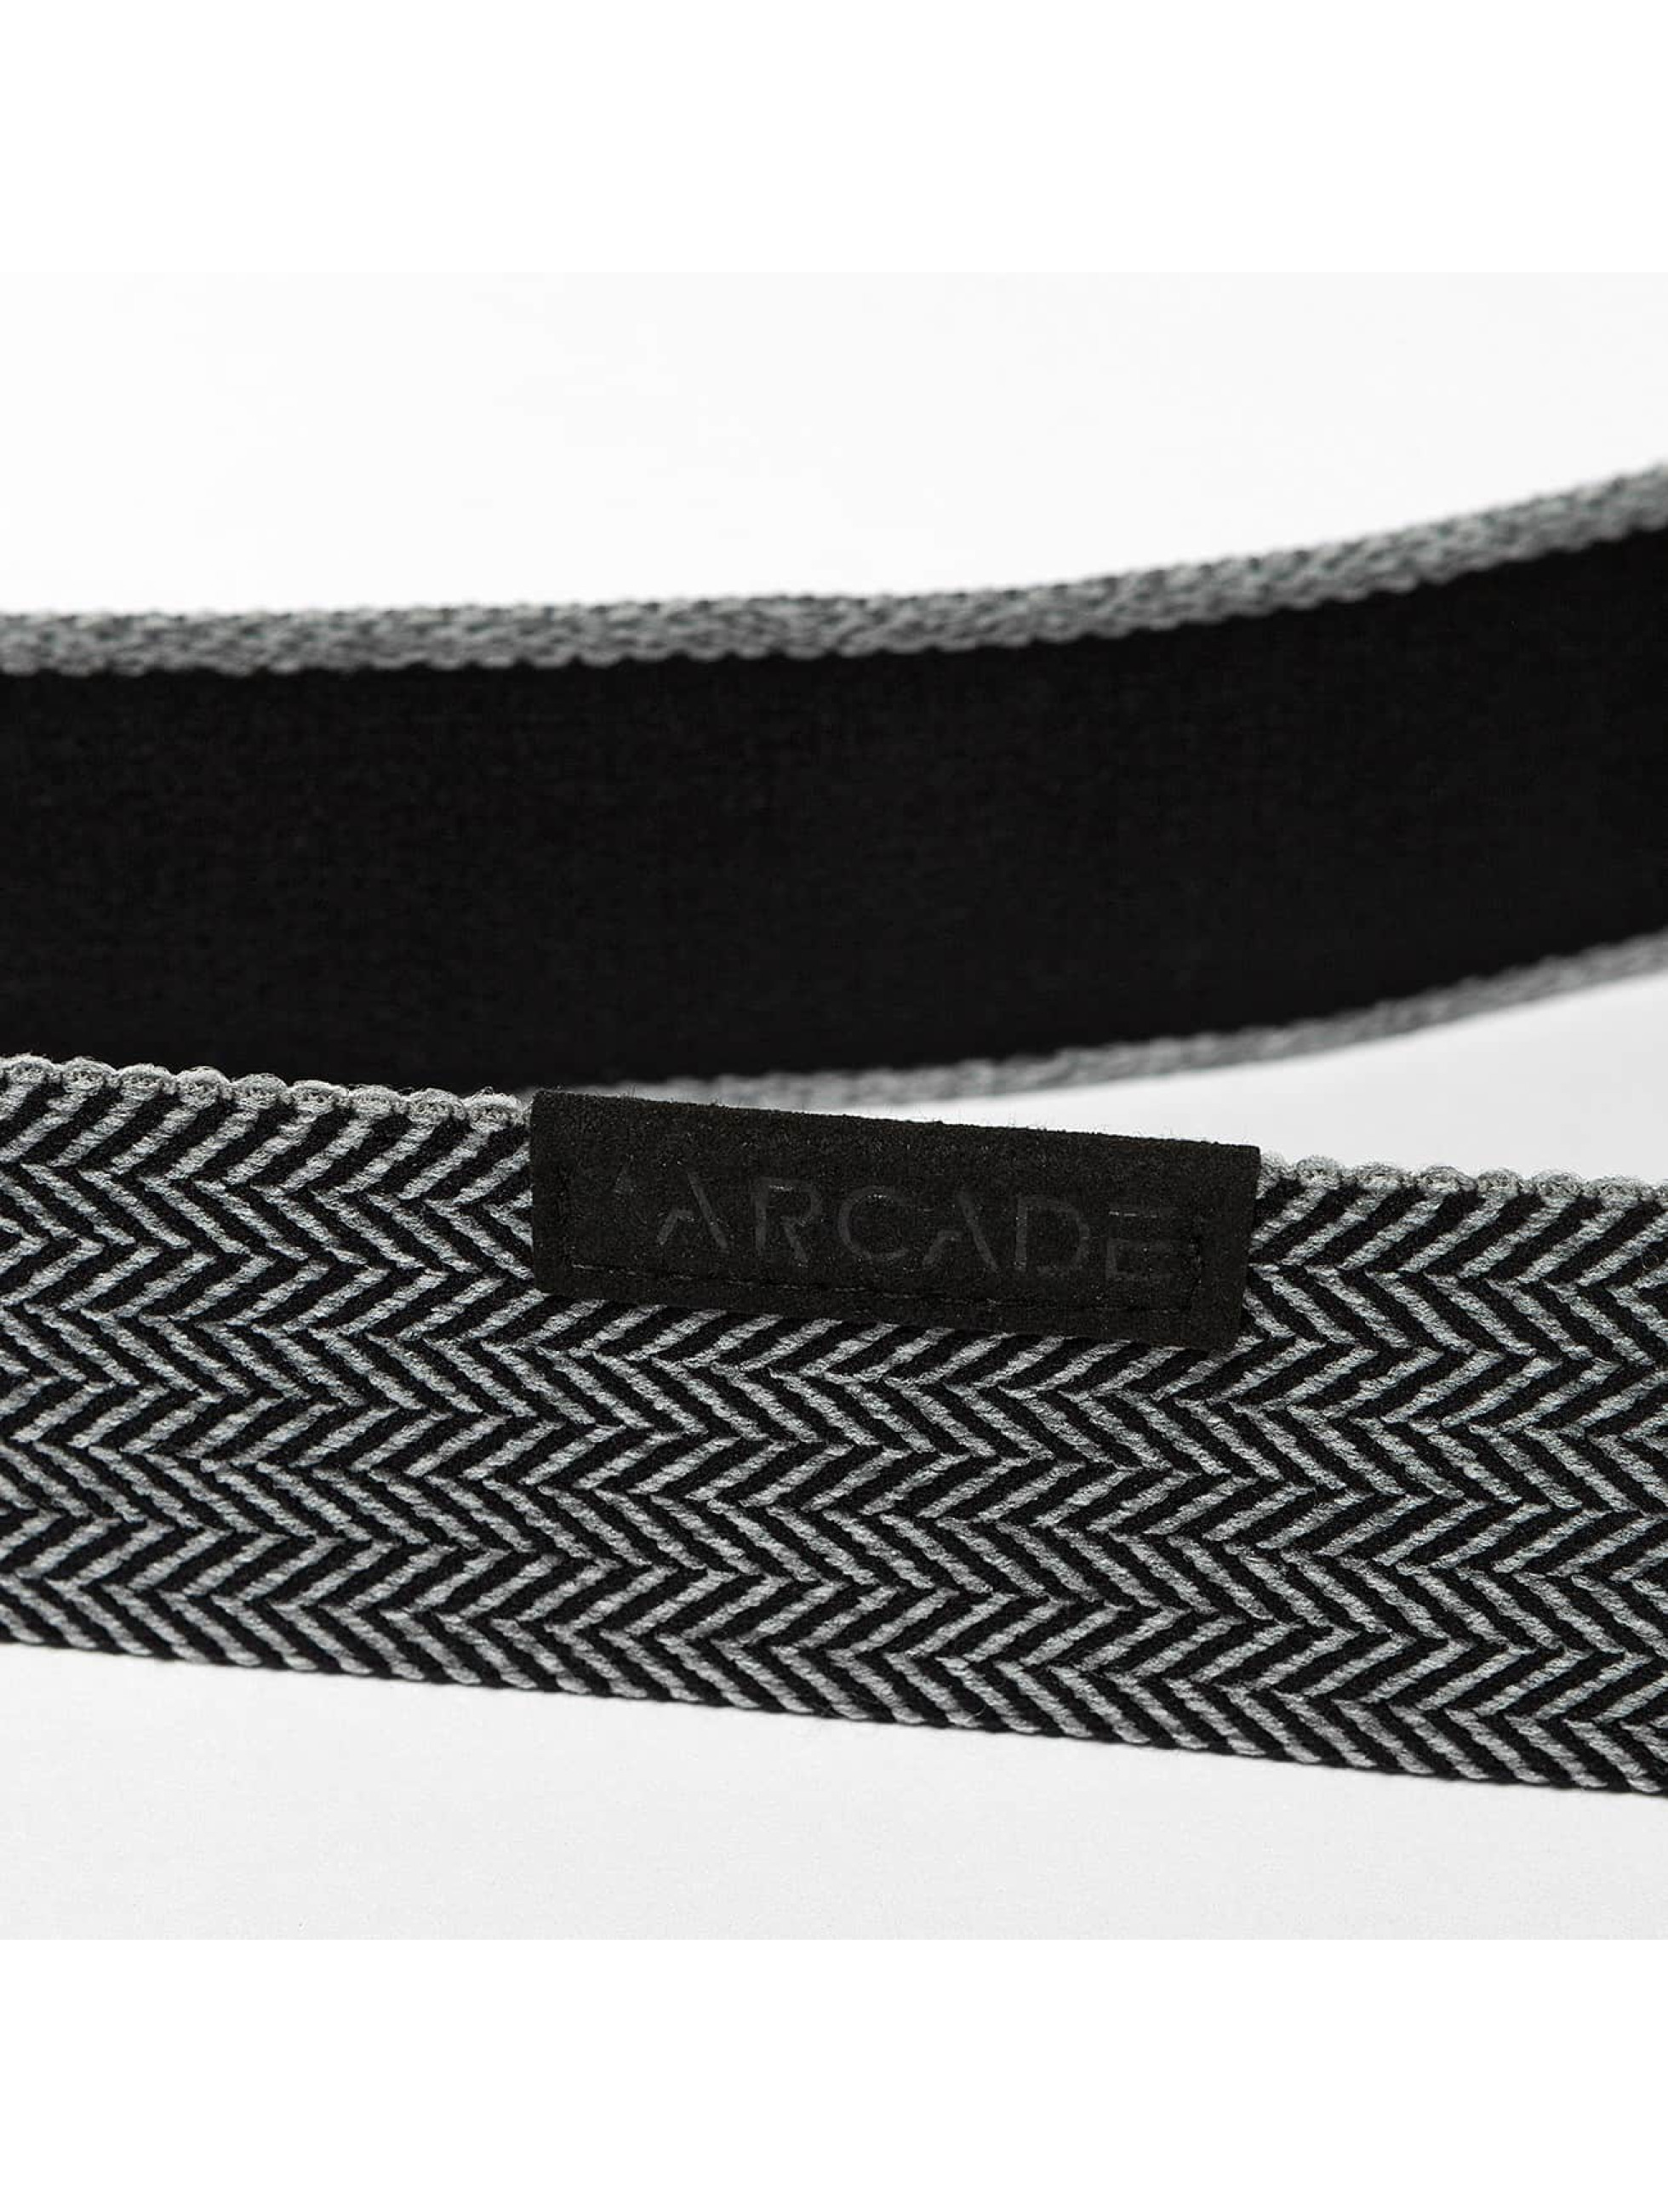 ARCADE Belts Reserve Collection Hemingway svart